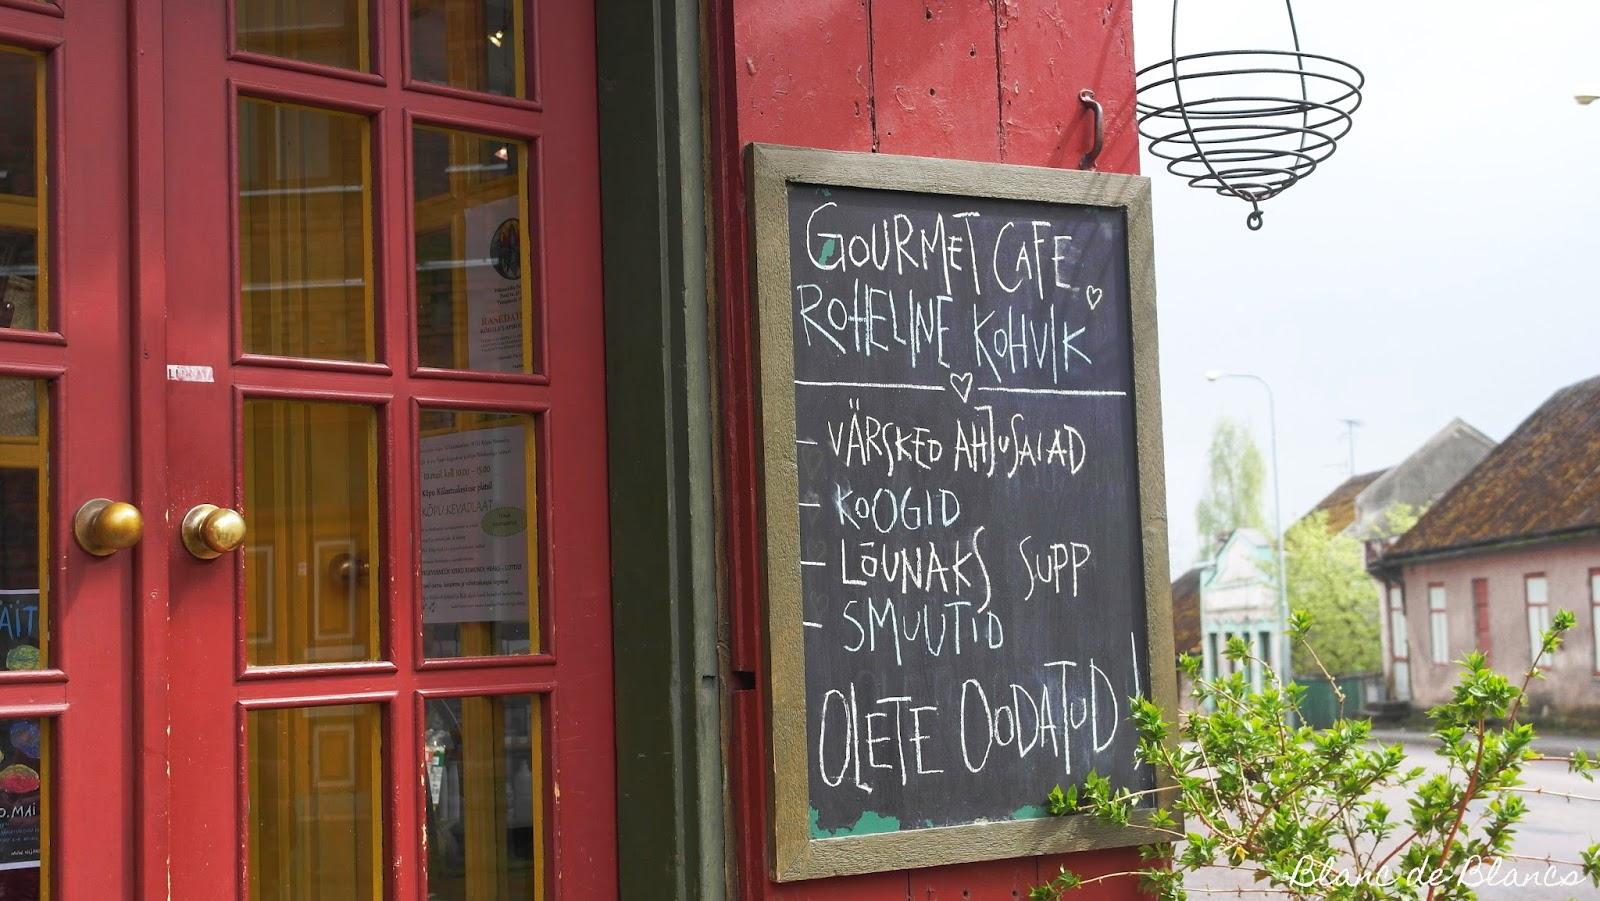 Roheline Kohvik Viljandi - www.blancdeblancs.fi